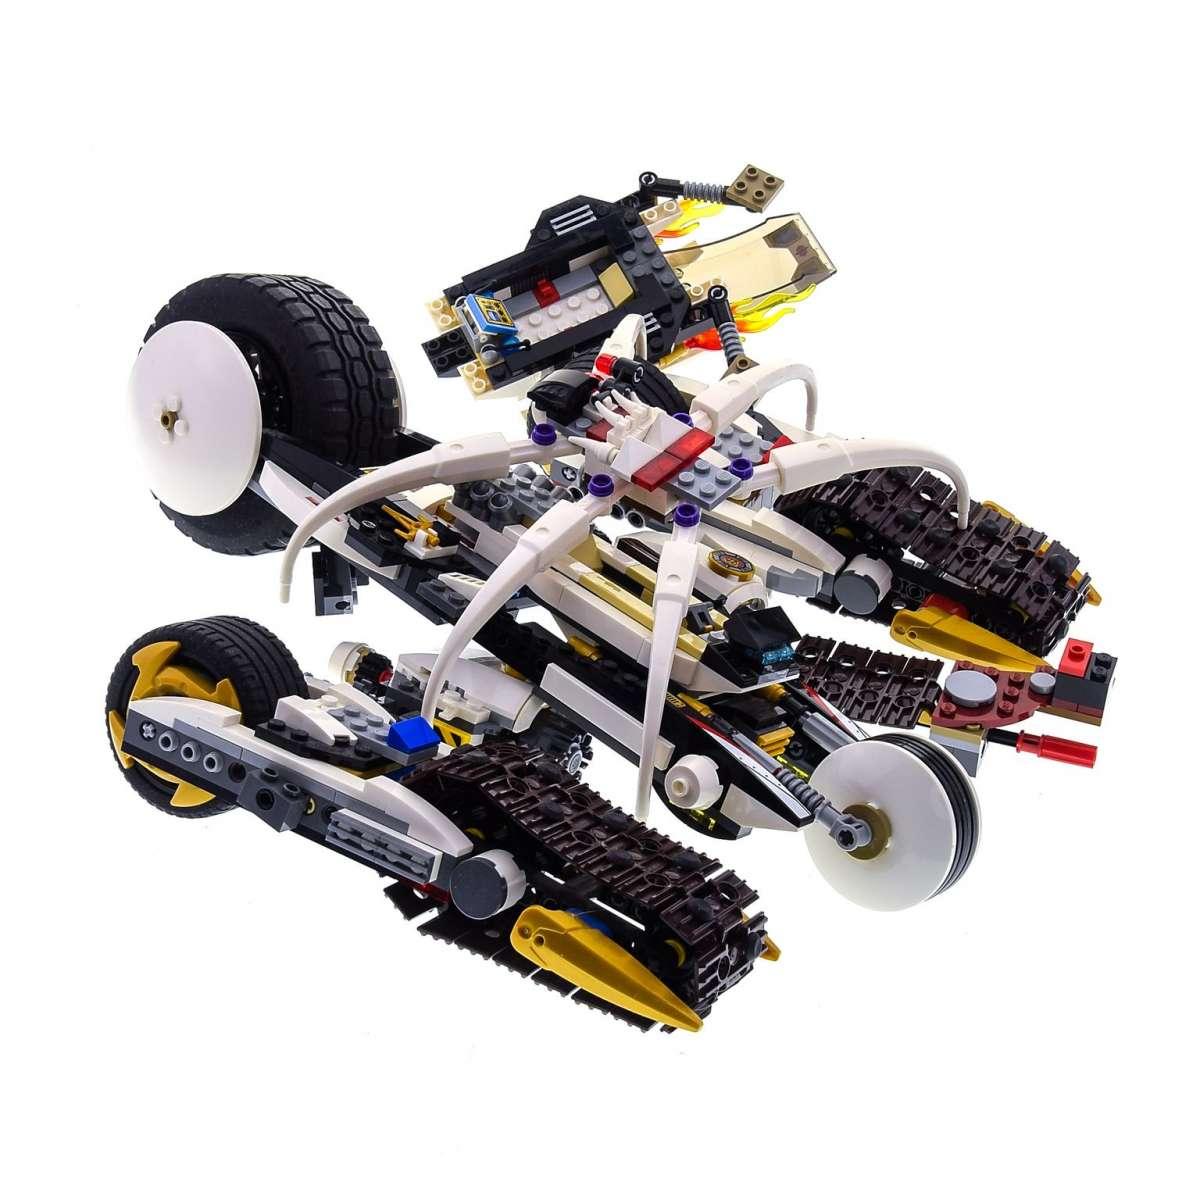 1 x Lego System Set Modell für Nr. 70595 Ninjago Day of ...